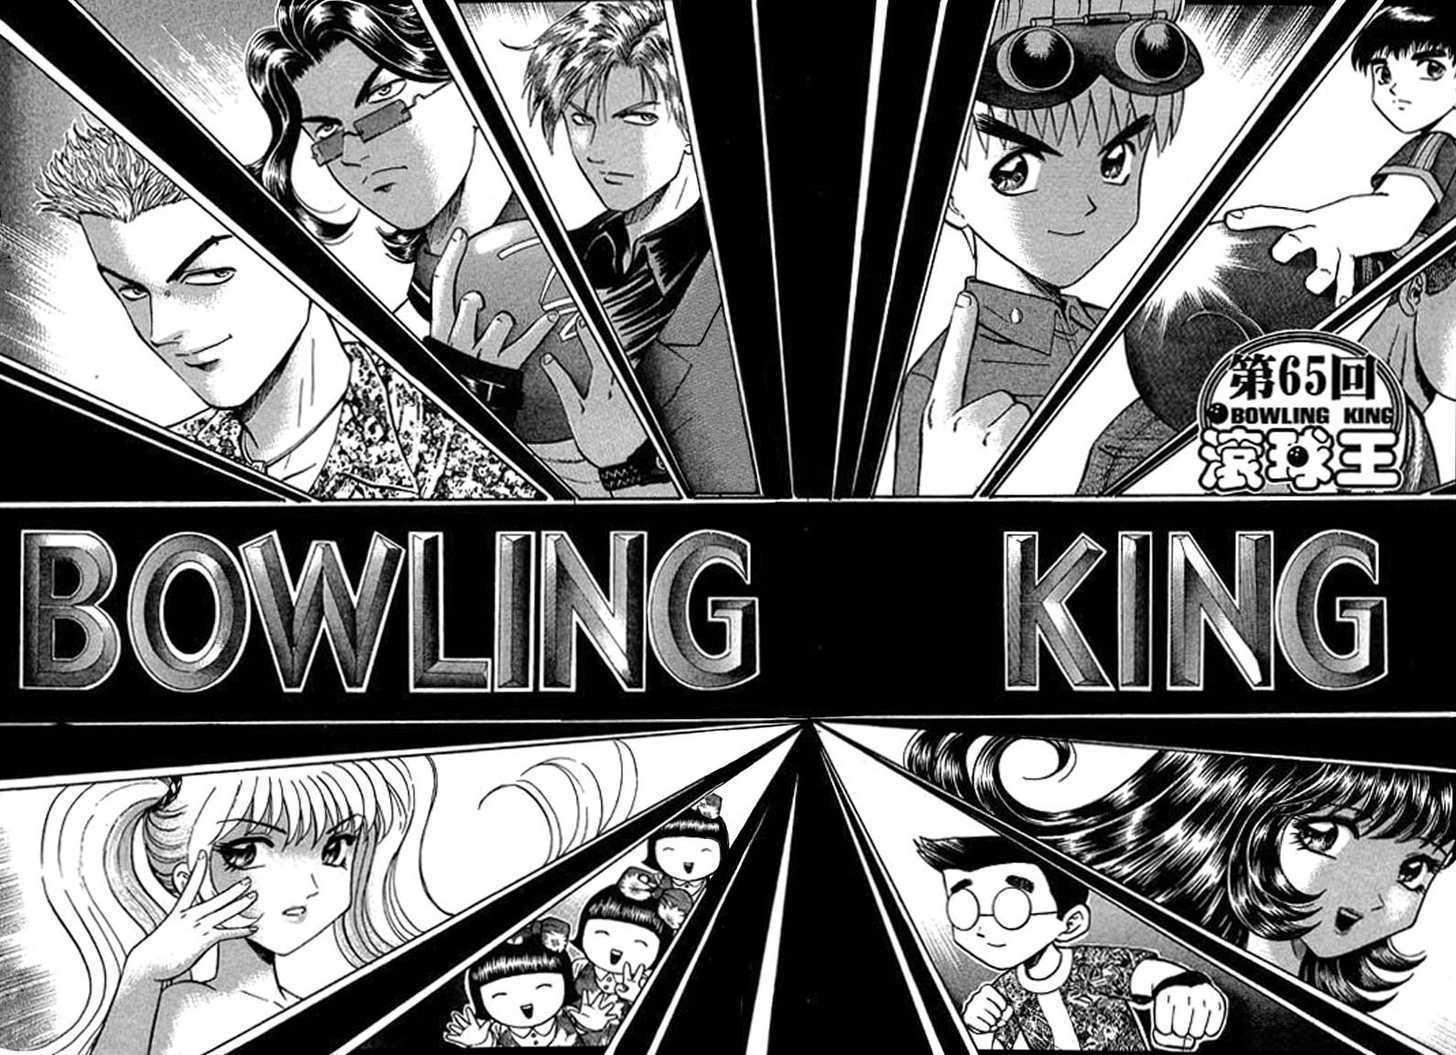 Bowling King 65 Page 1